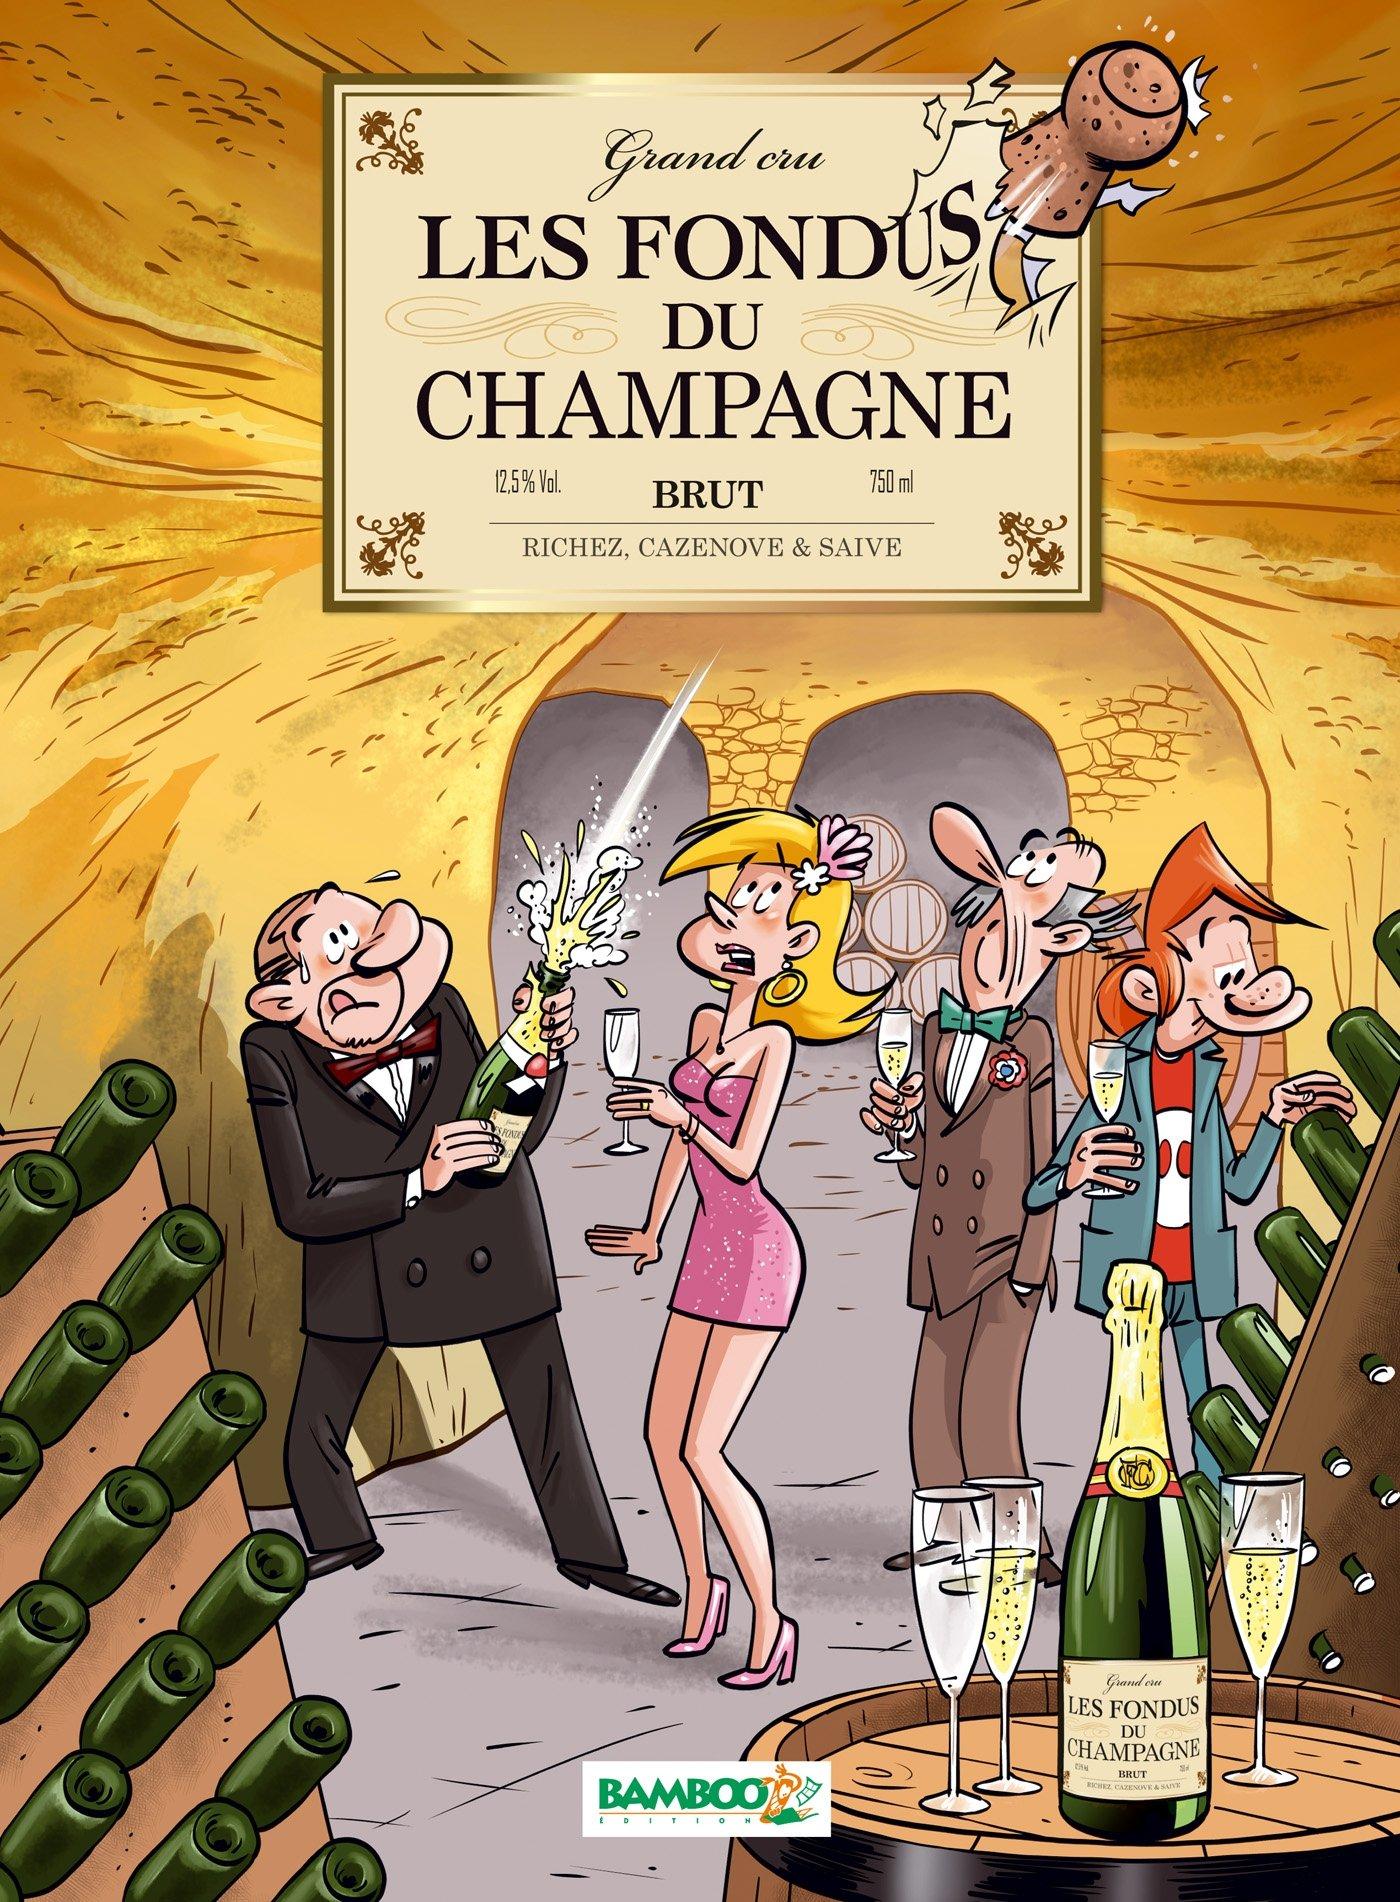 Rassemblement 2018 Champagne Bla  bla ..... 91k9Js43-oL